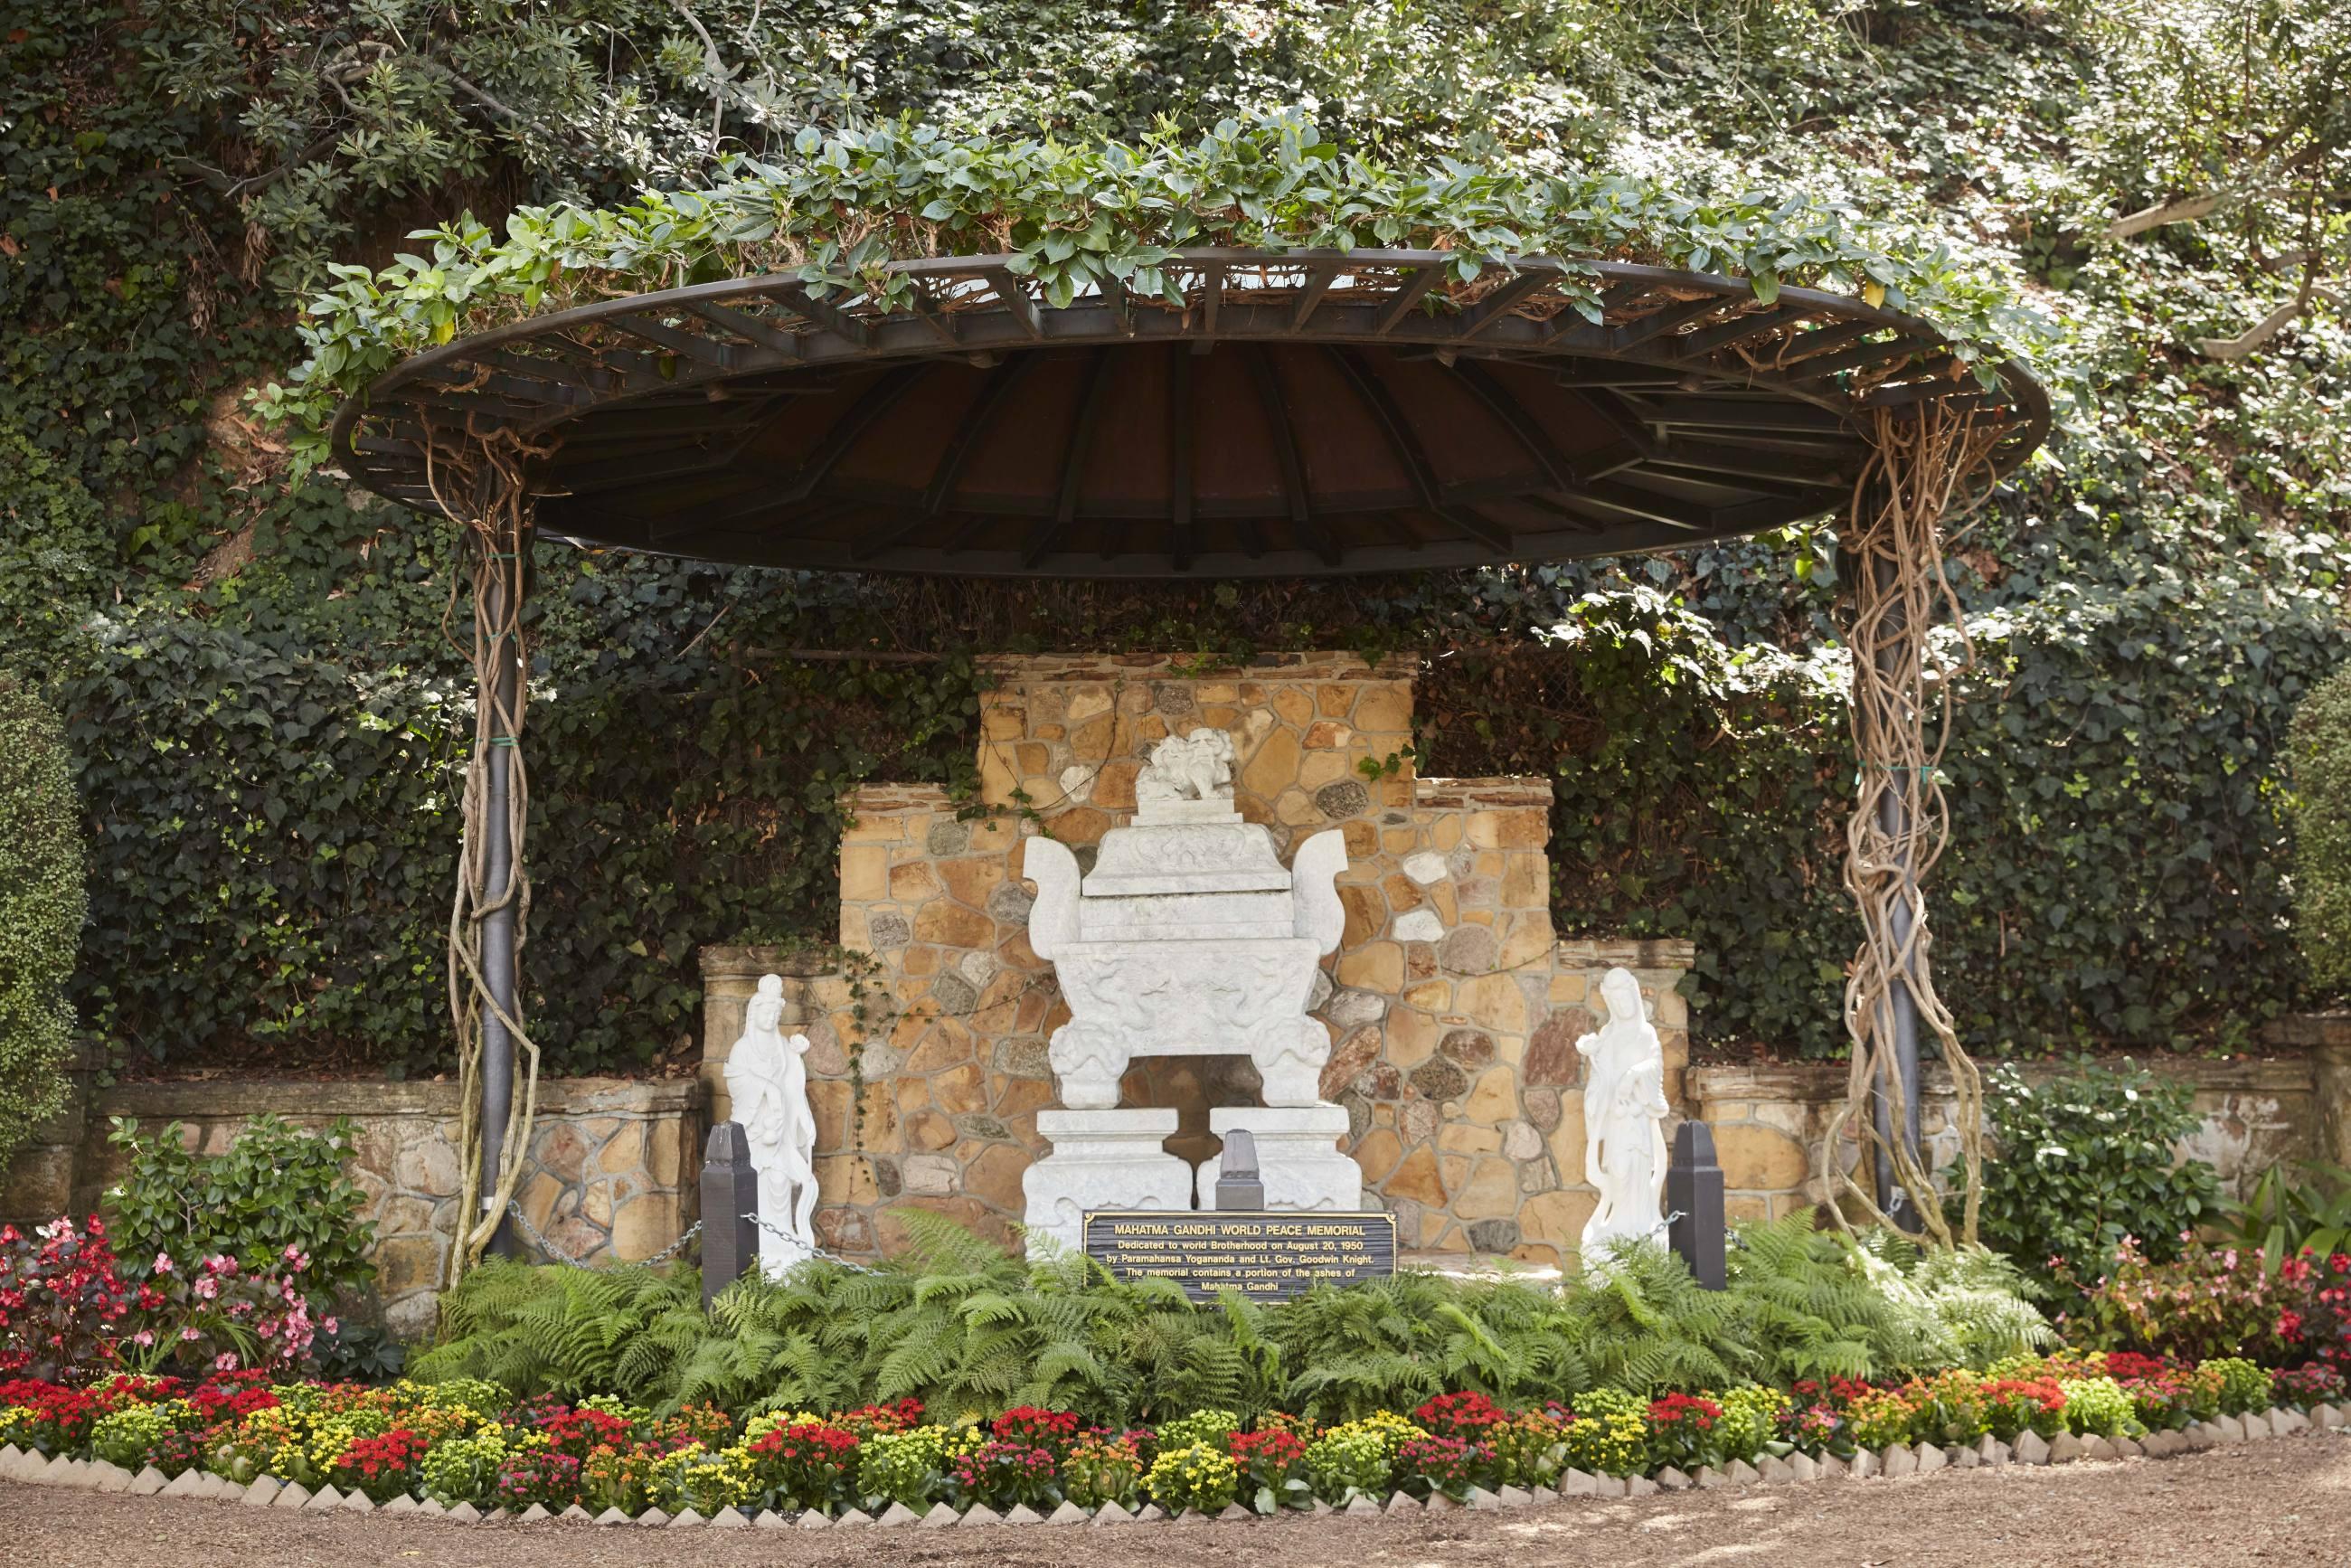 MahatmaGandhi World Peace Memorial at the Self-Realization Fellowship Lake Shrine